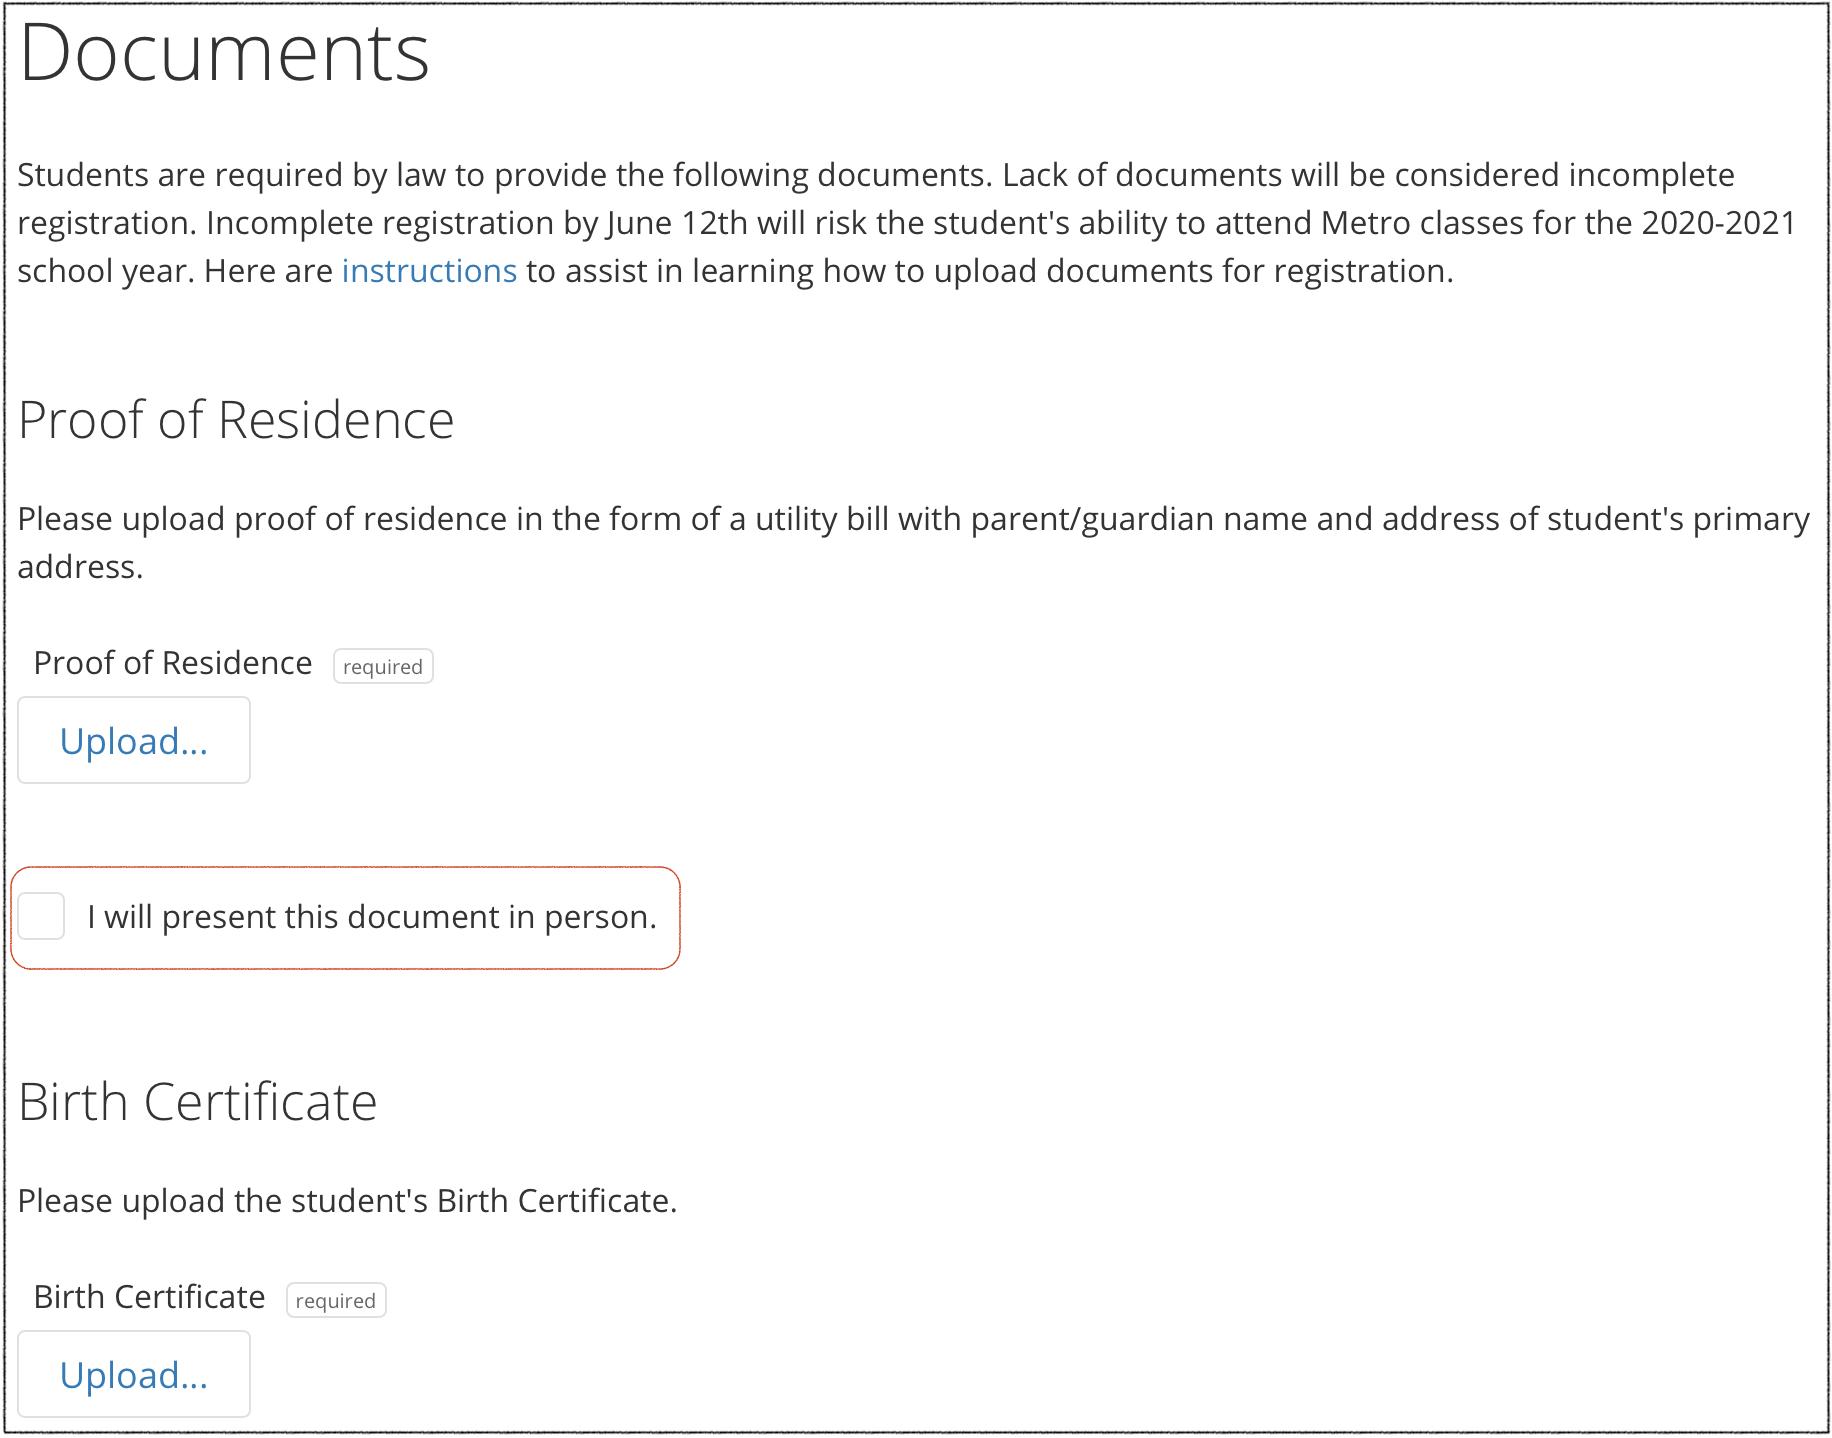 DocumentsScreen